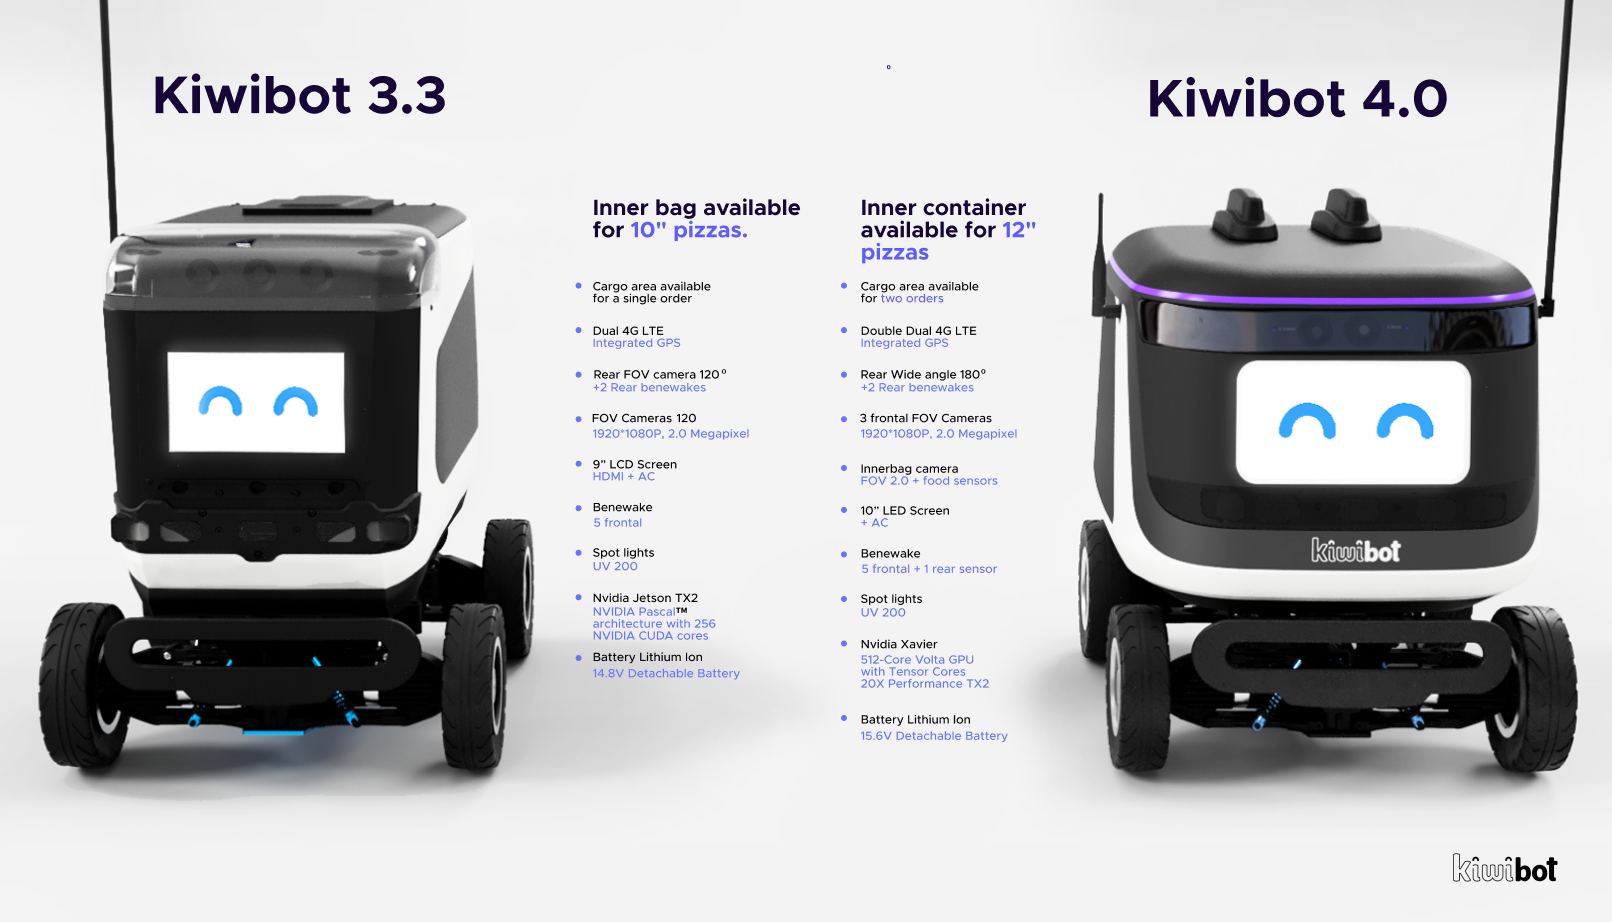 Kiwibot 3.3 vs 4.0